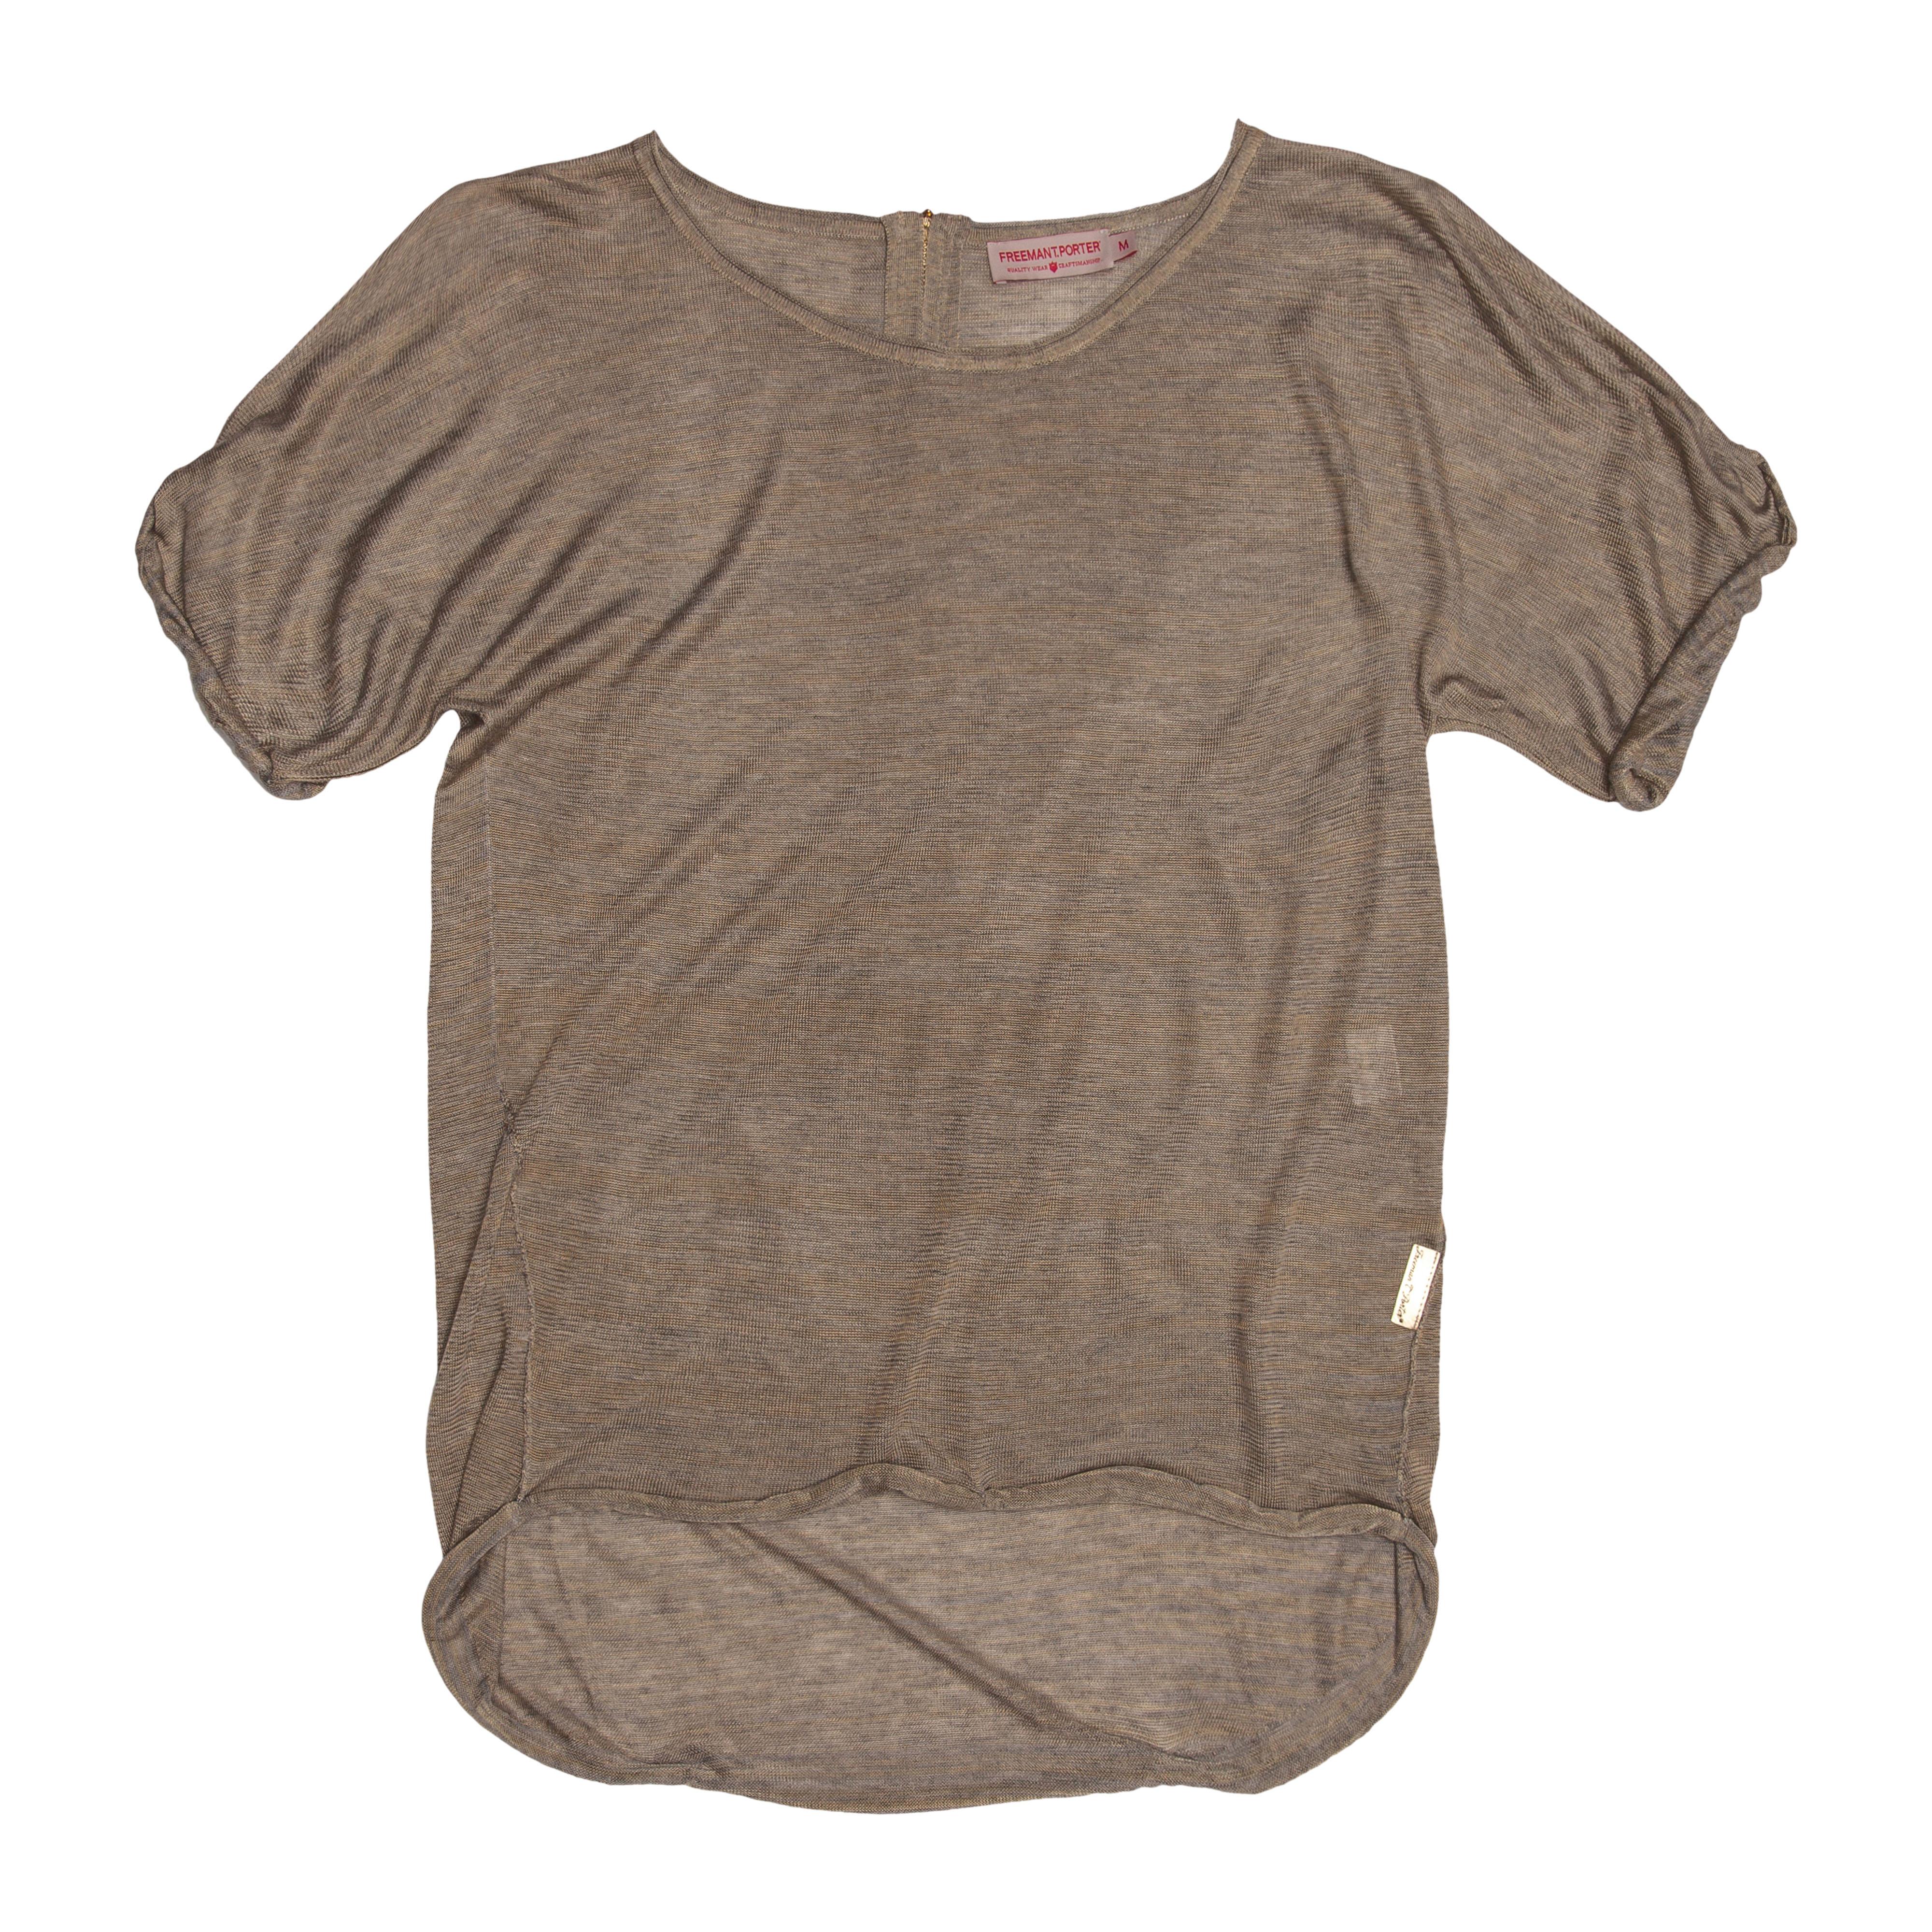 Freeman T. Porter Viskose-Shirt im Love, Peace and Festivals-Look